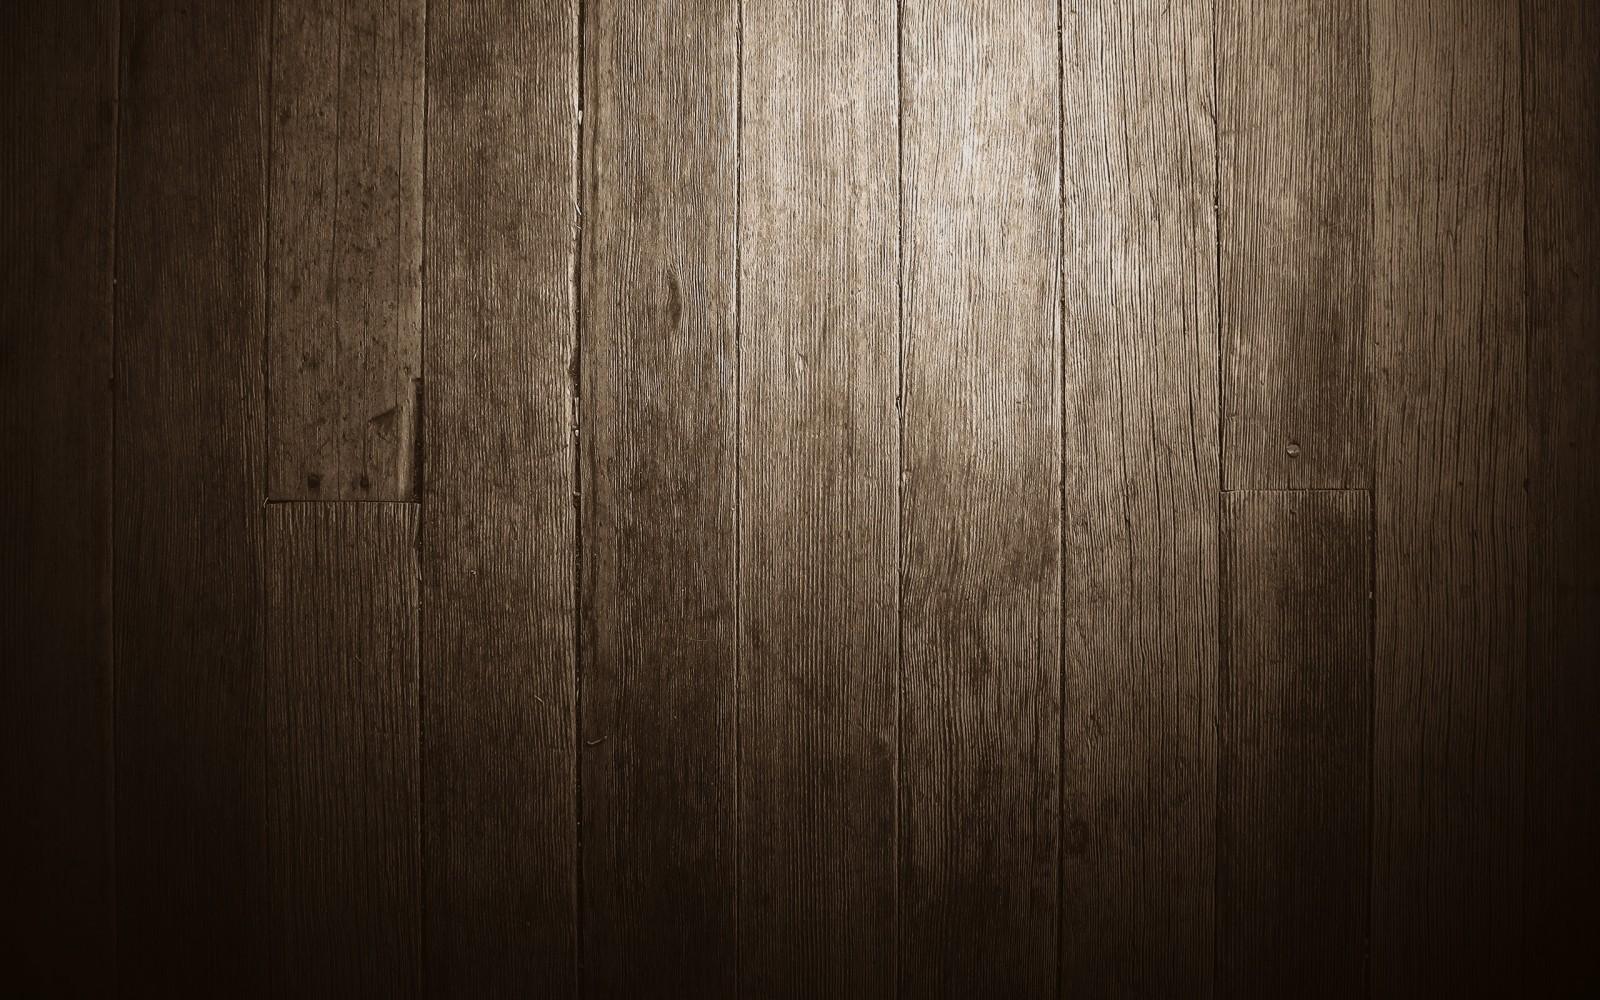 background_wood_surfa8xknw.jpg